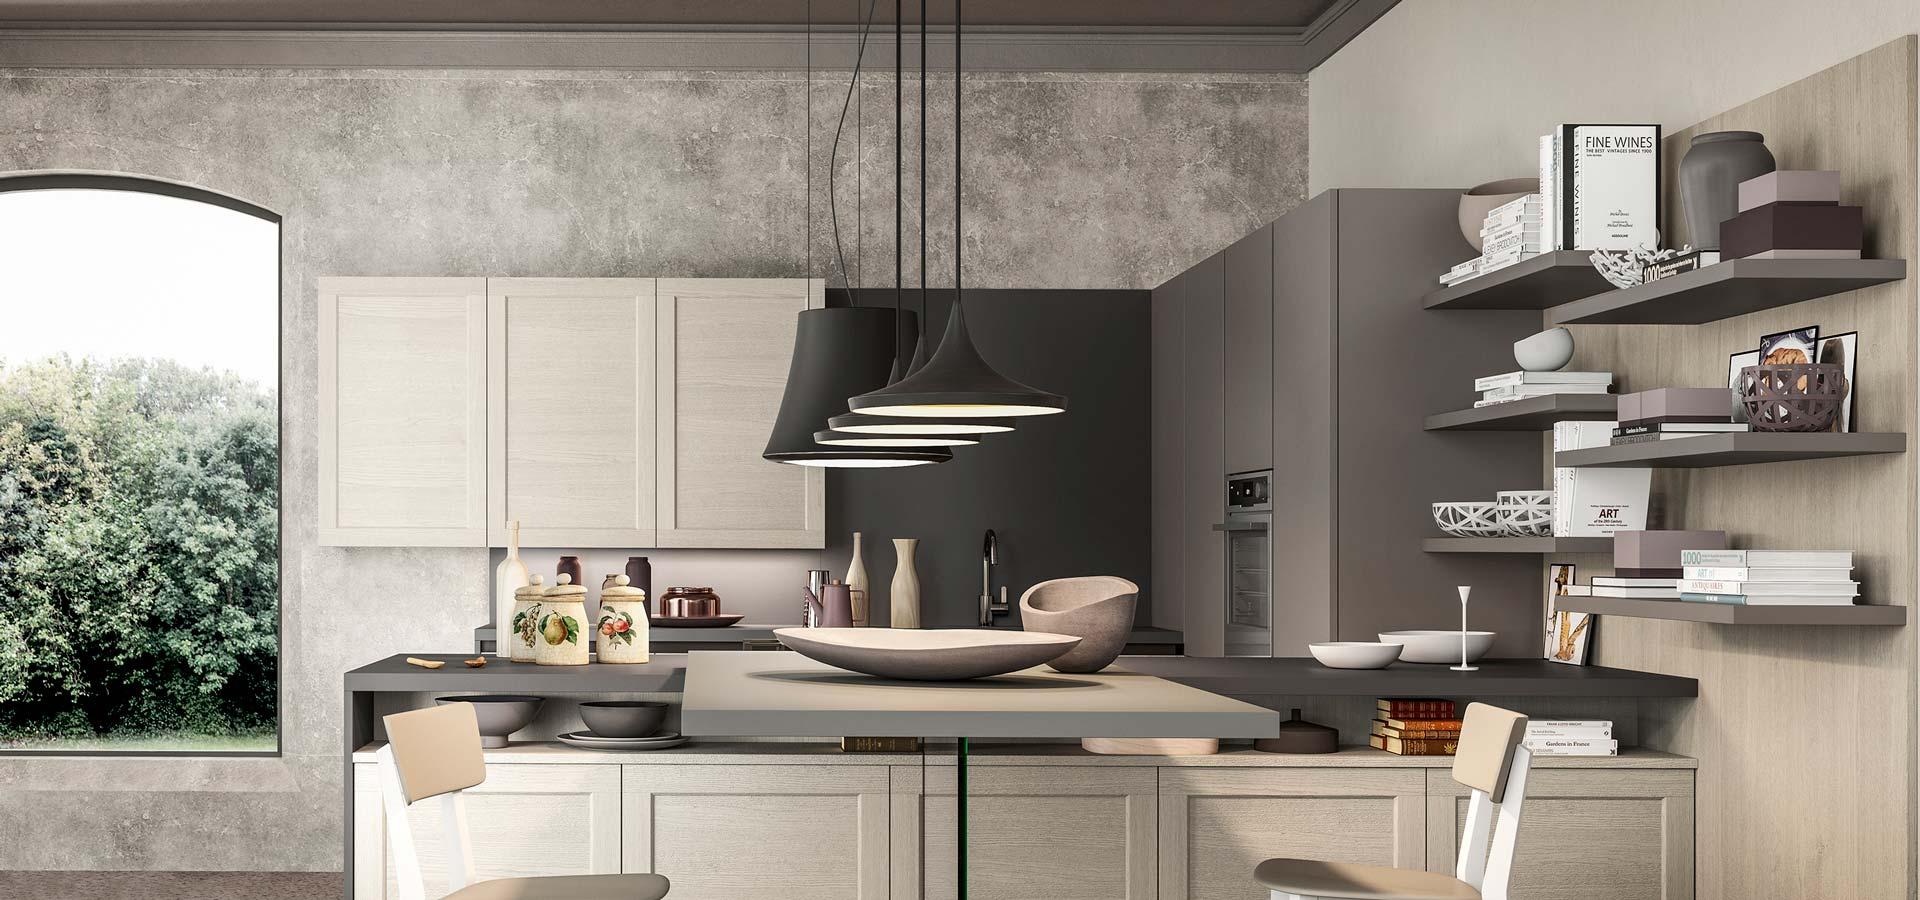 Cucina con ante telaio moderne a padova for Arredo 3 cucine opinioni